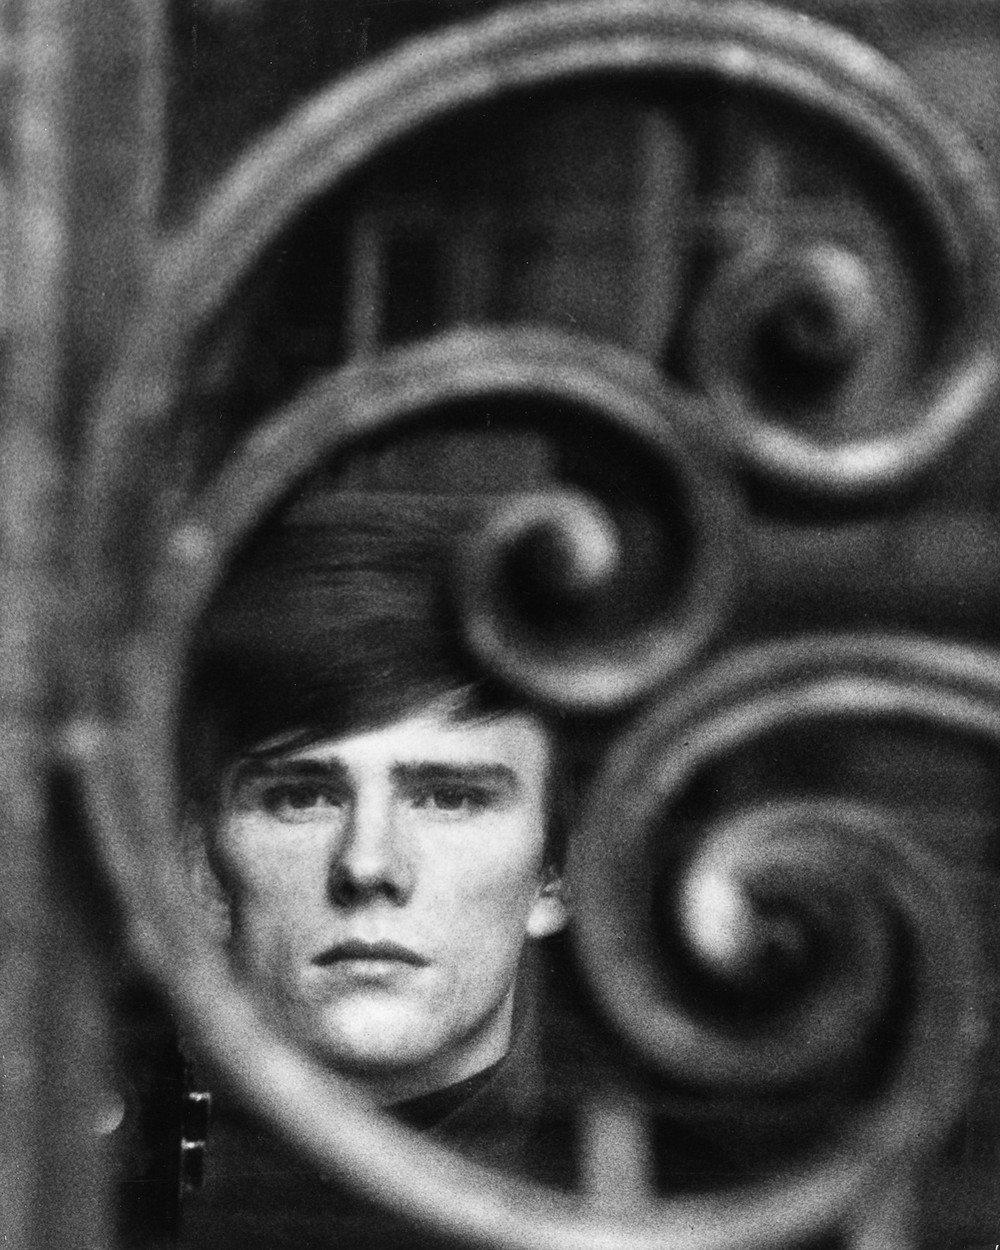 Stuart Sutcliffe Posed In Hamburg